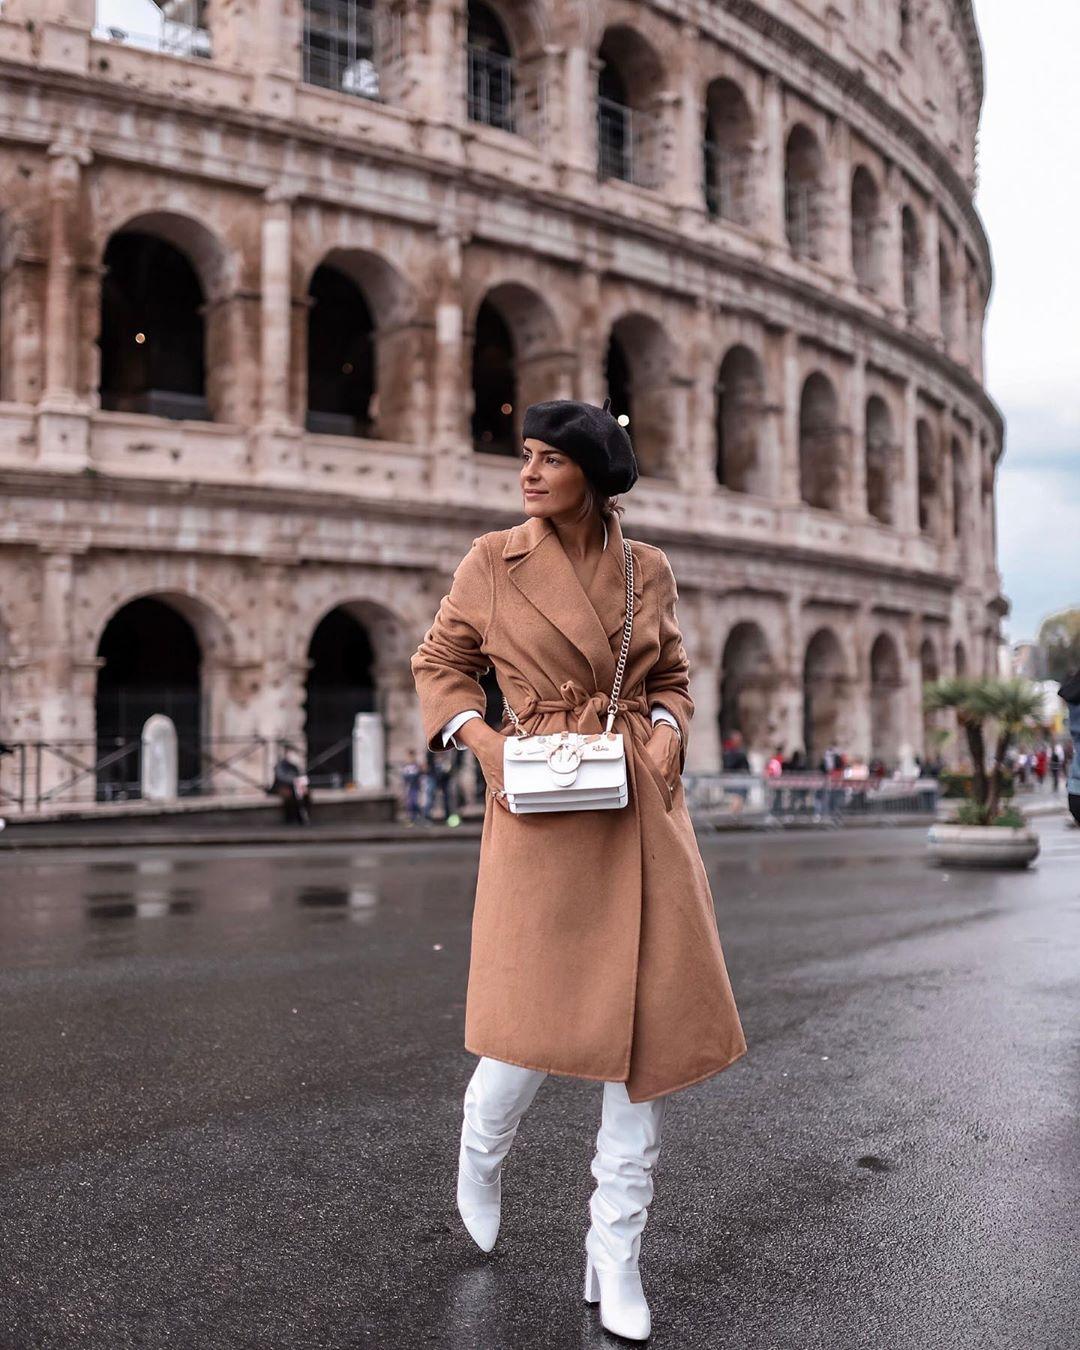 high heeled leather knee high boots de Zara sur joanavaz_